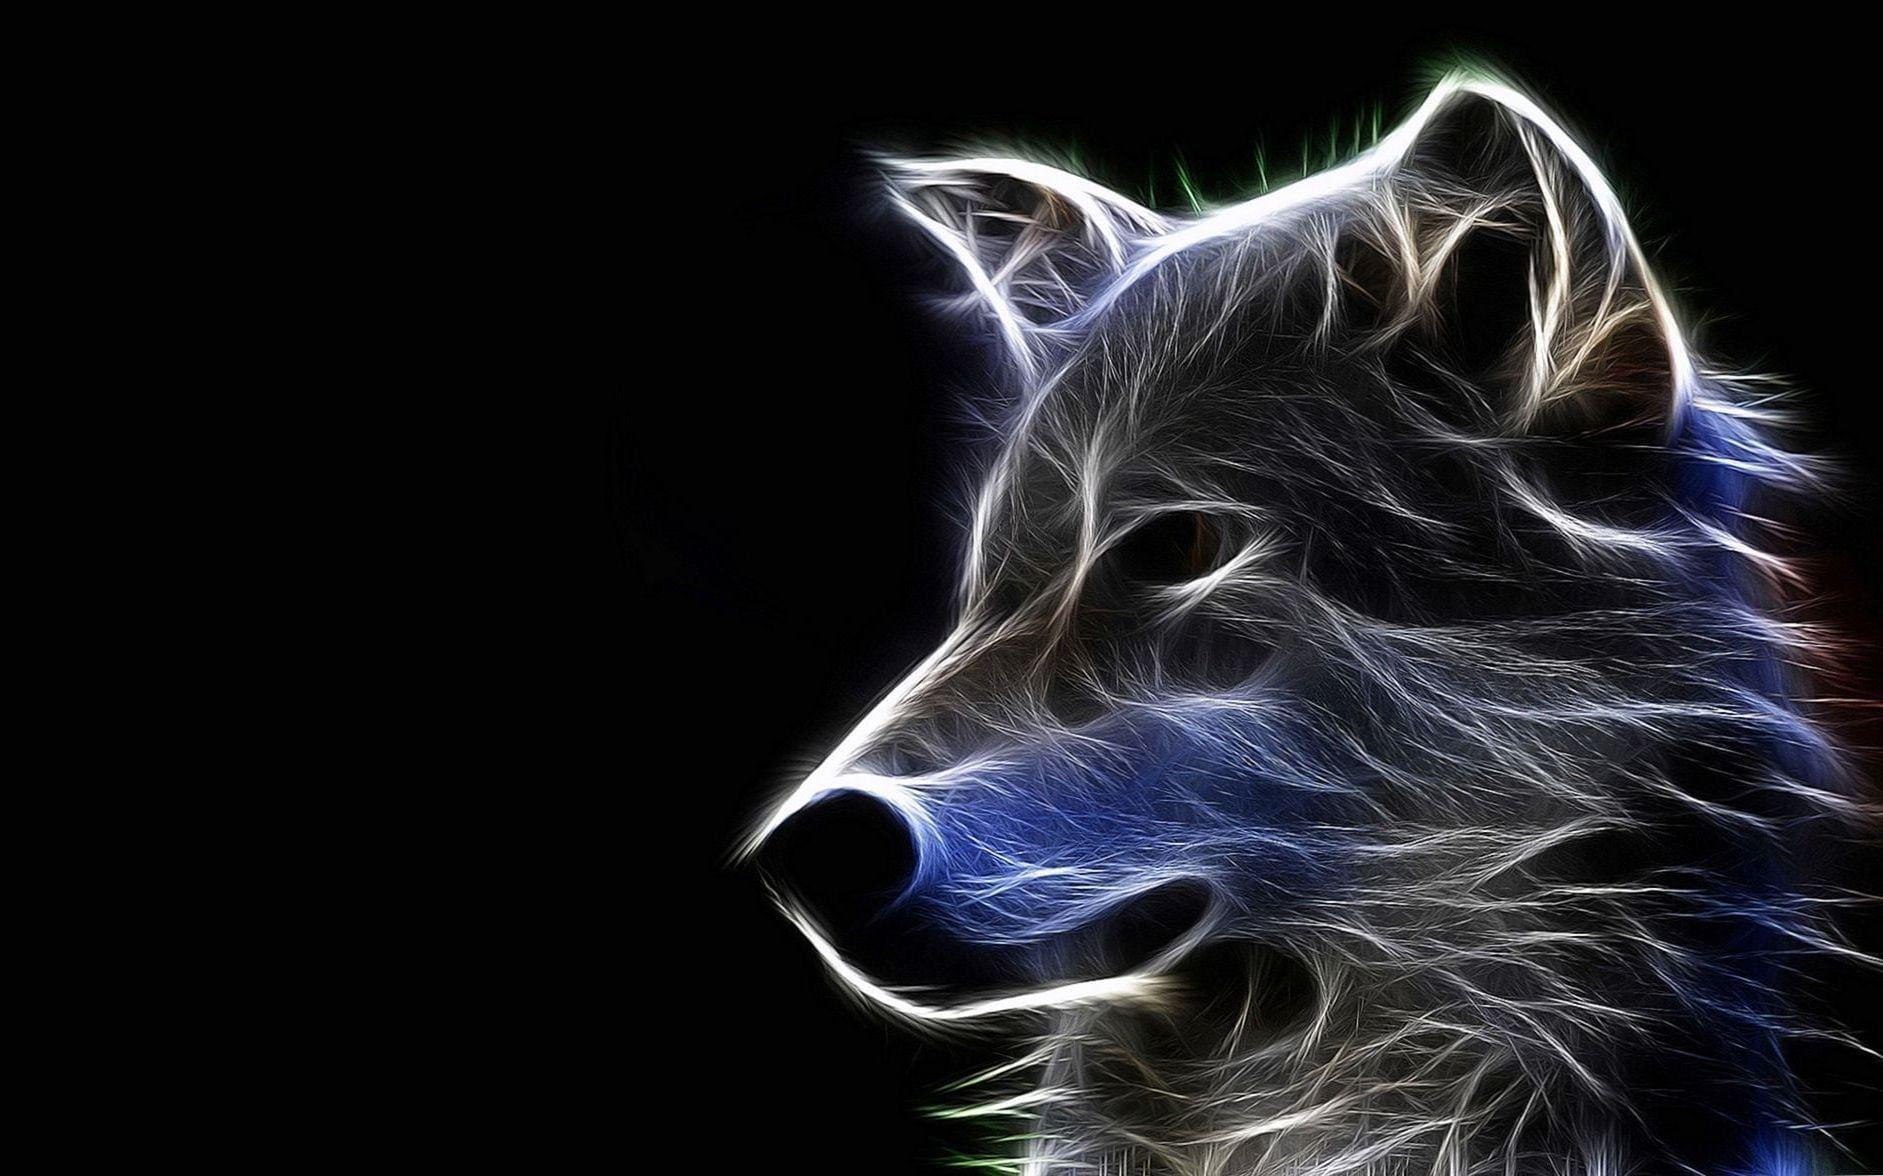 Cool Hd Wallpapers Wolf Cool Hd Wallpapers Wolf Wolf Wallpapers Wolf Wallpaper Wallpaper Wolf